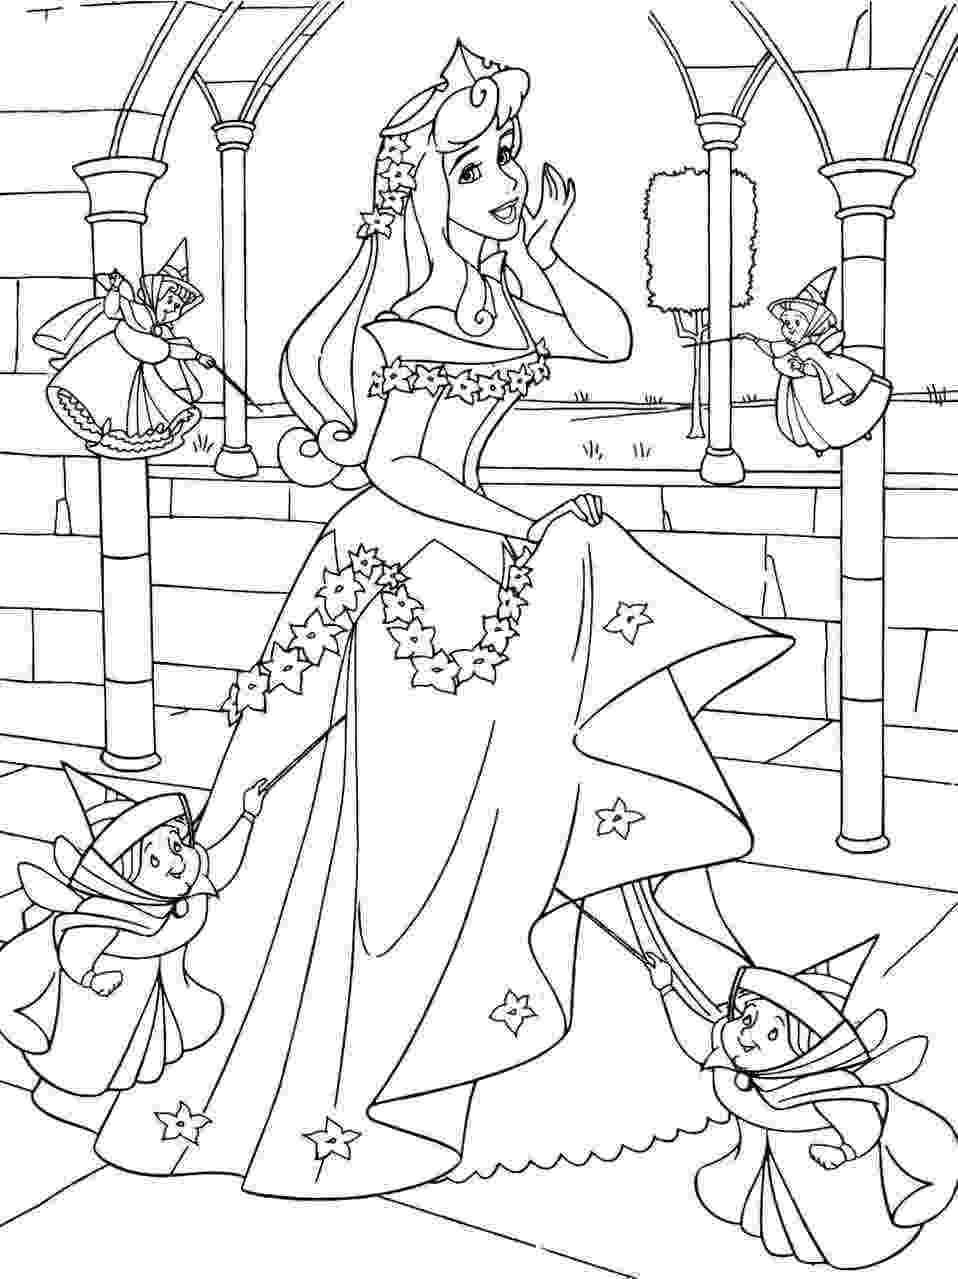 coloring sleeping beauty sleeping beauty coloring pages print disney princess coloring sleeping beauty